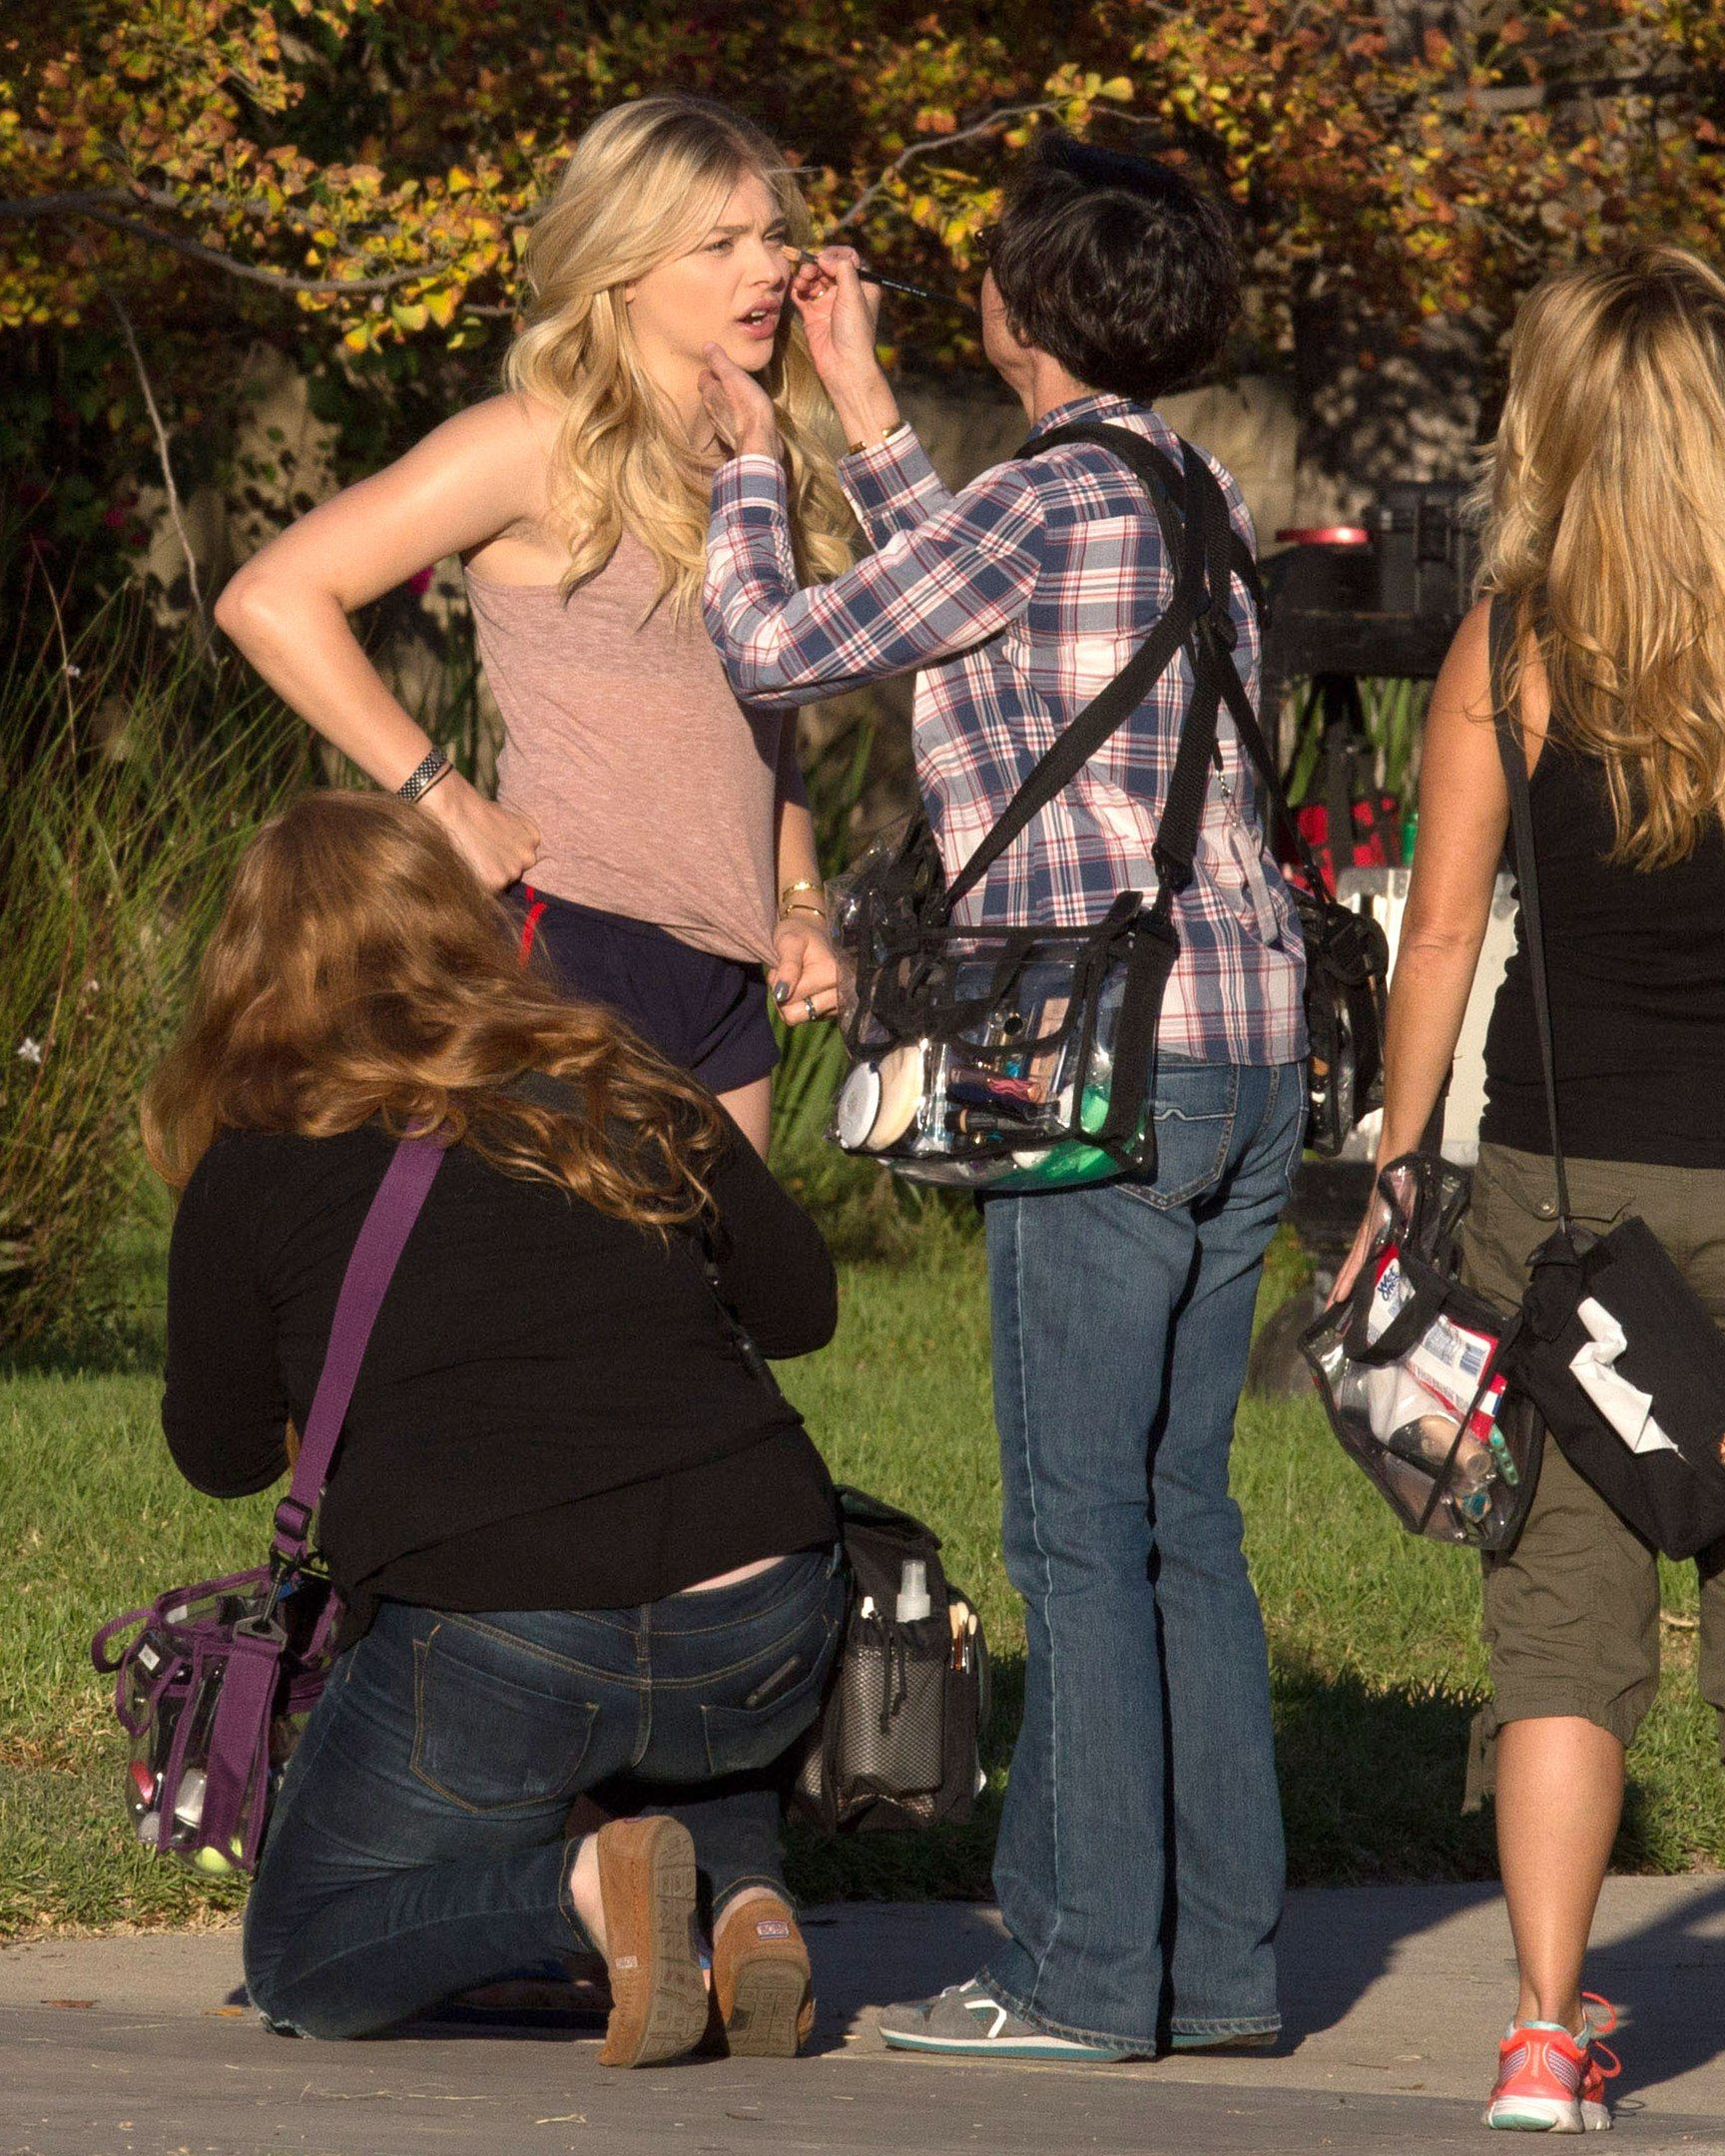 #ChloëGraceMoretz on the set of #Neighbors2 #BehindTheScenes #ontheset #makeup